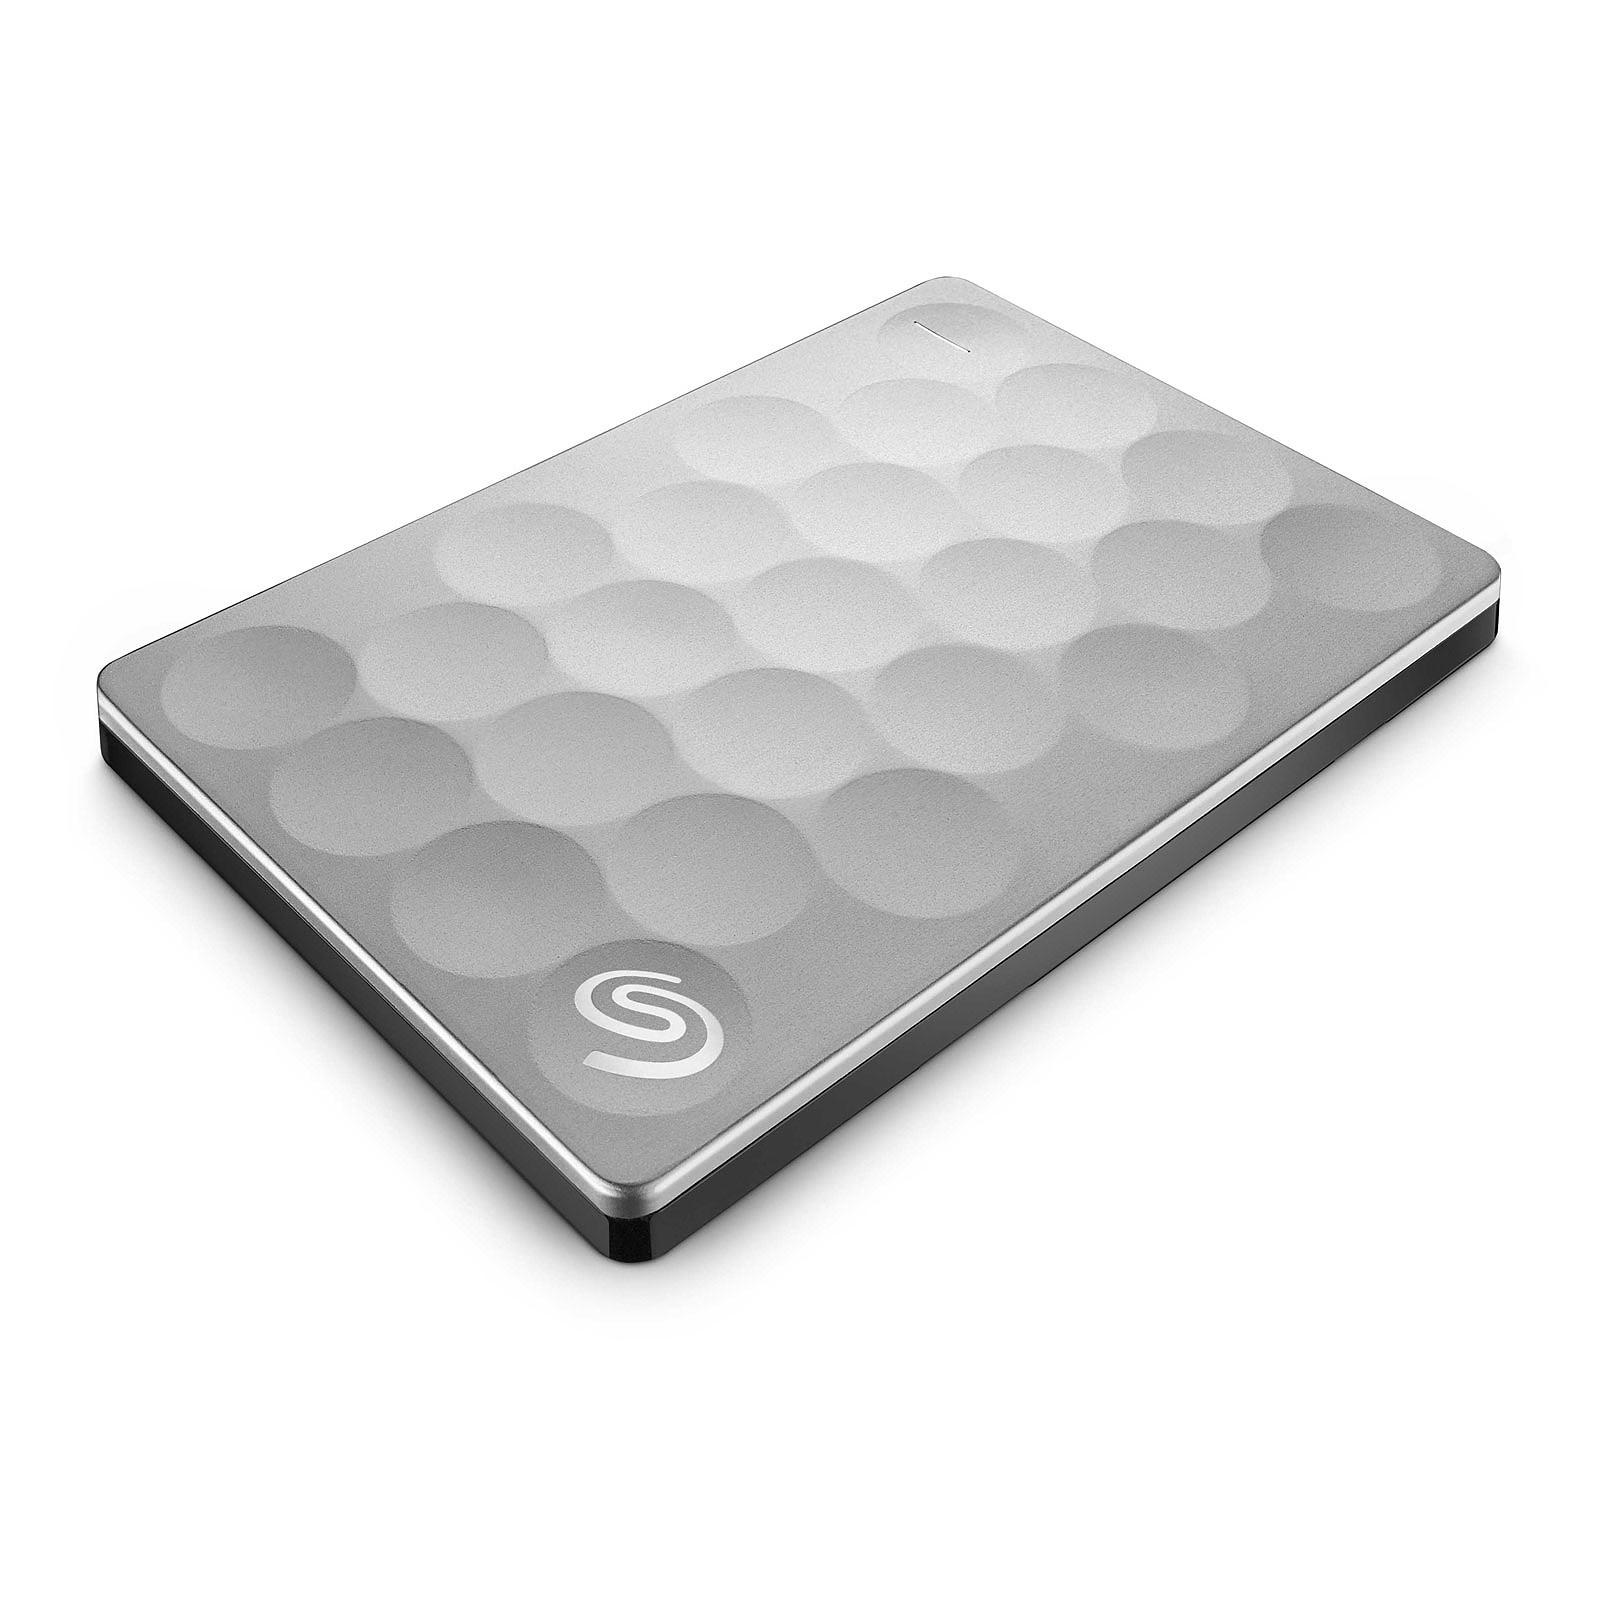 Seagate Backup Plus Ultra Slim 1 To Platine (USB 3.0)